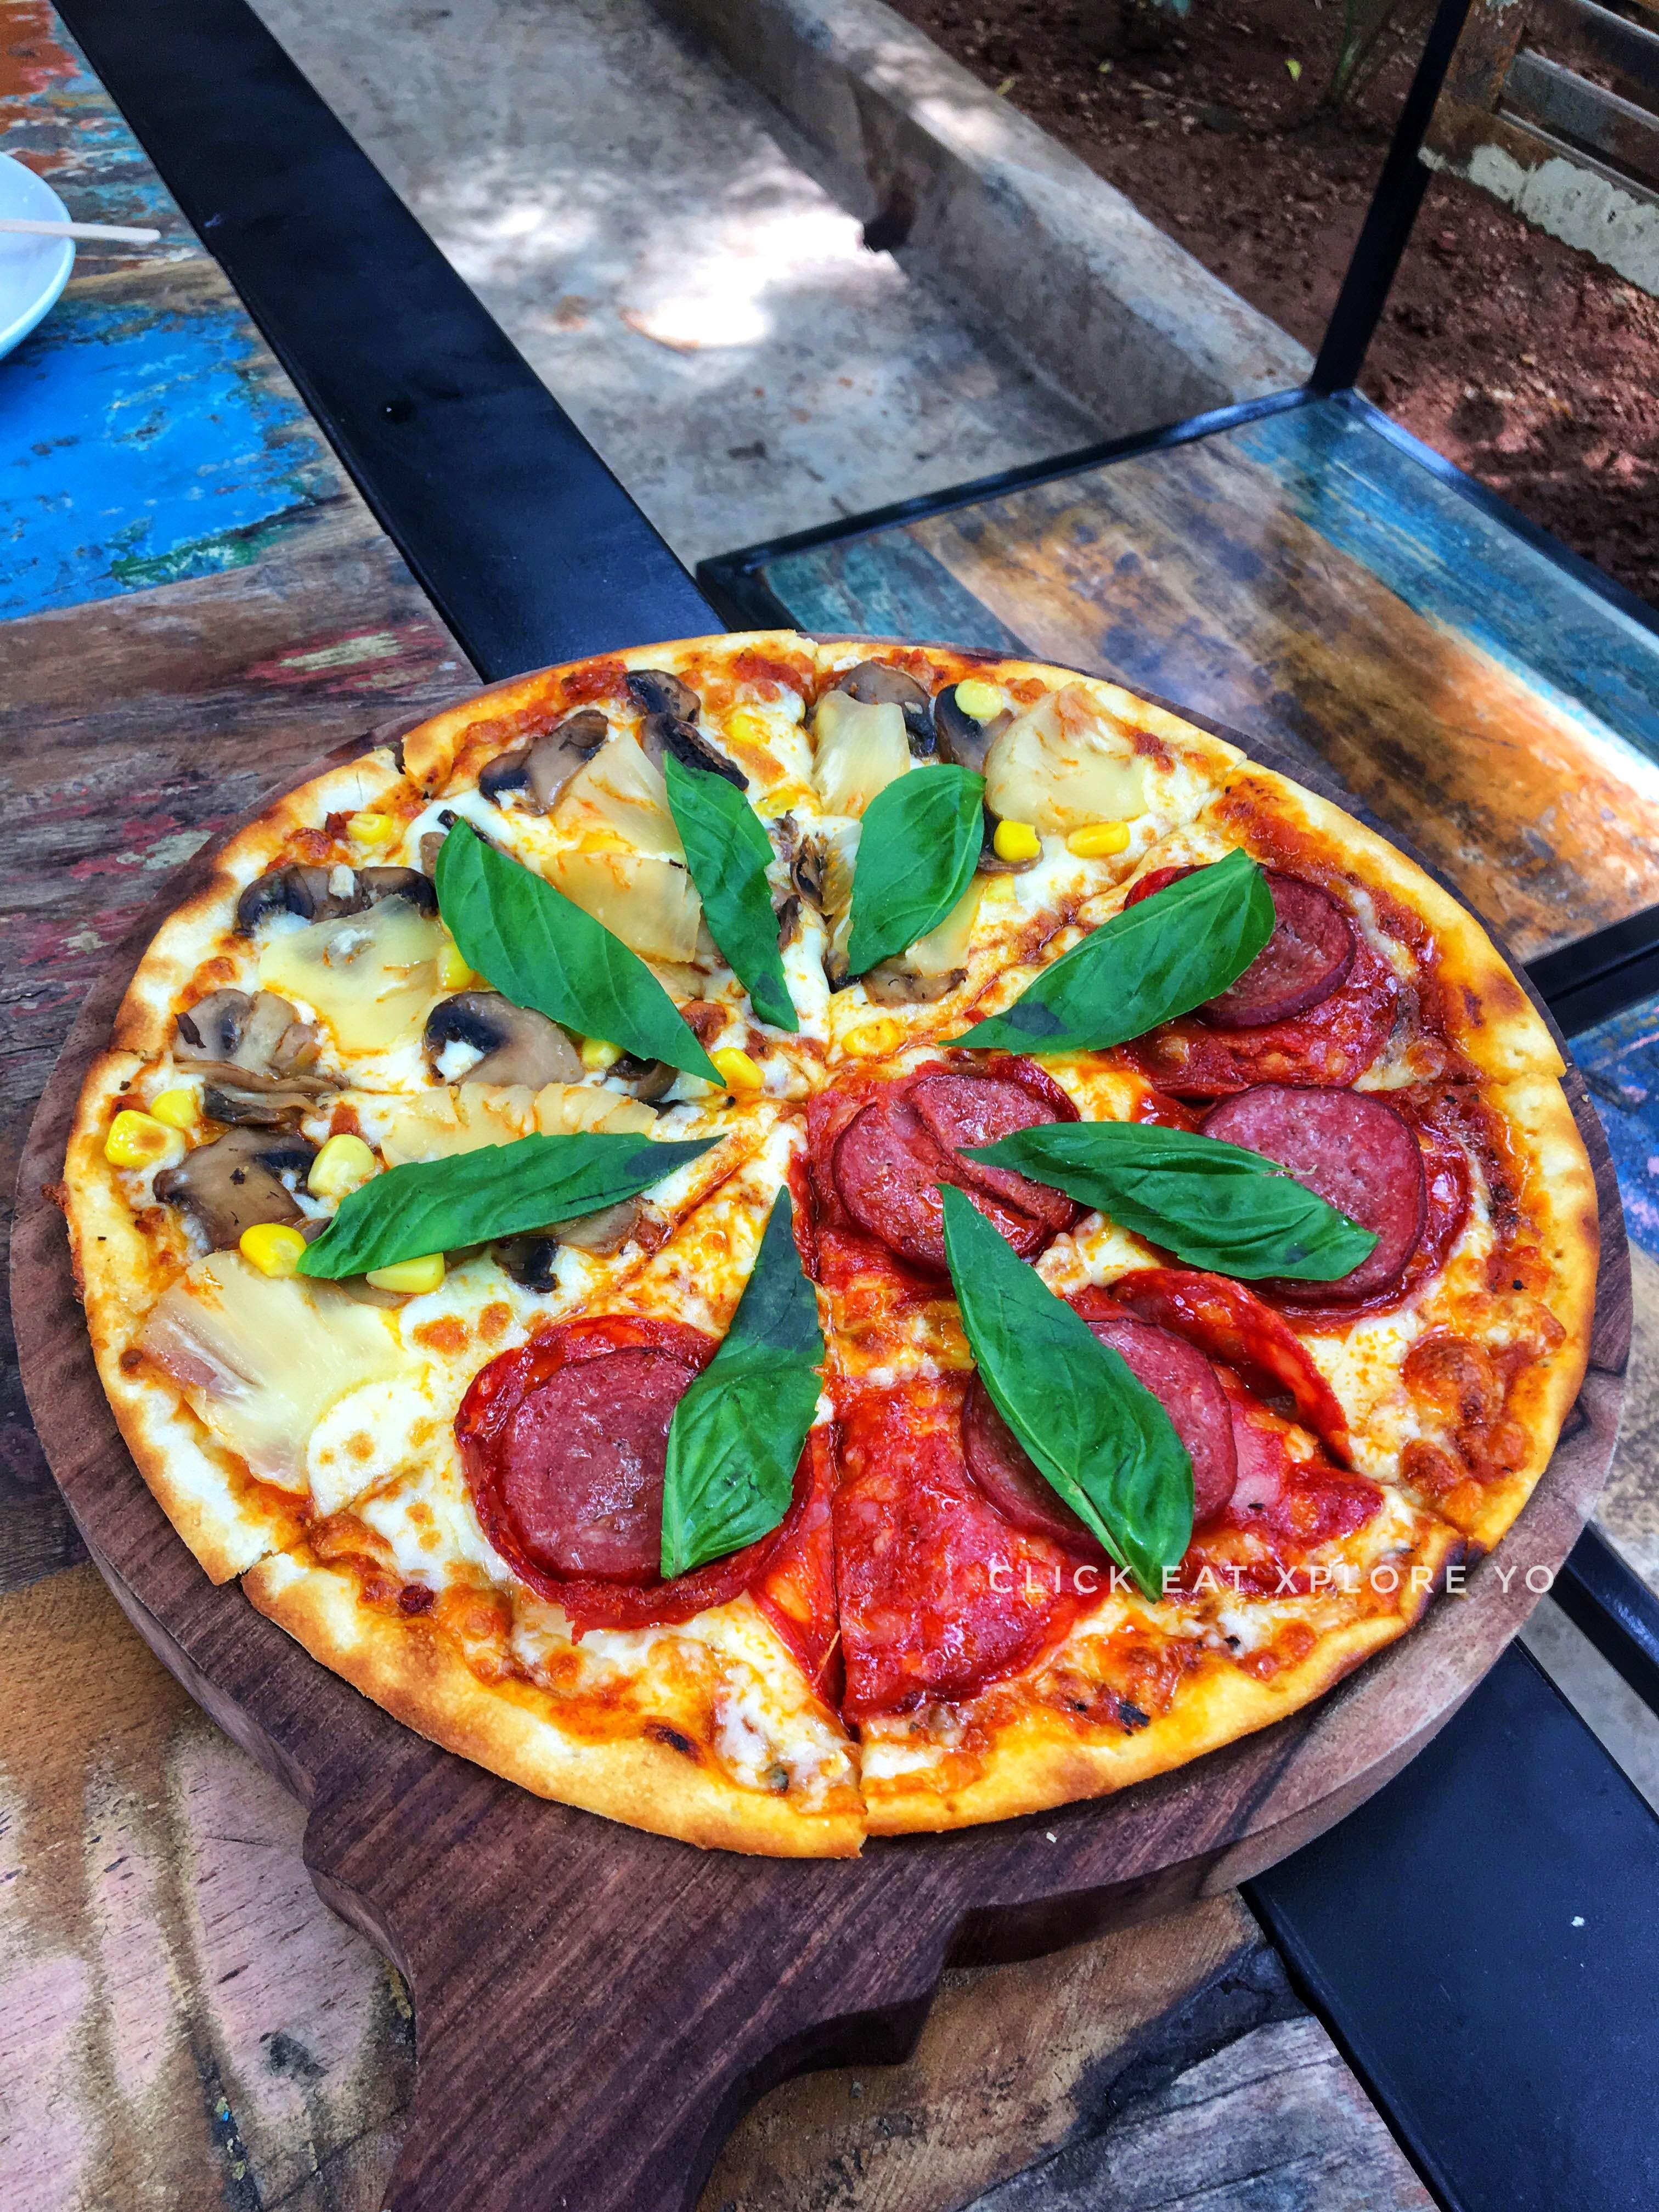 Dish,Food,Pizza,Cuisine,California-style pizza,Ingredient,Pizza cheese,Flatbread,Italian food,Recipe